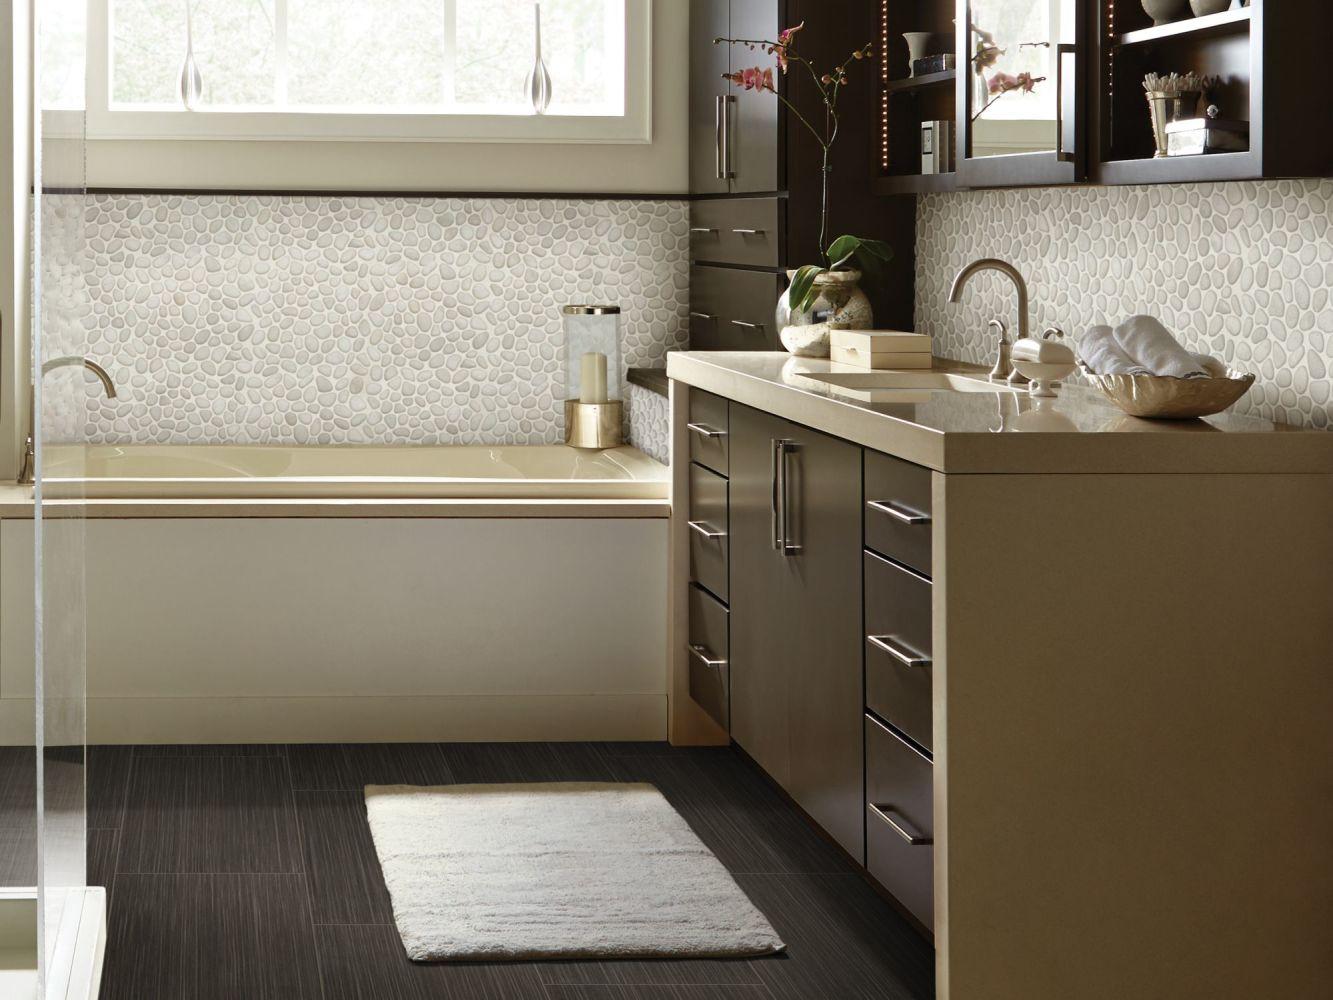 Shaw Floors Toll Brothers Ceramics River Rock Honed Serenity 00111_TLL65